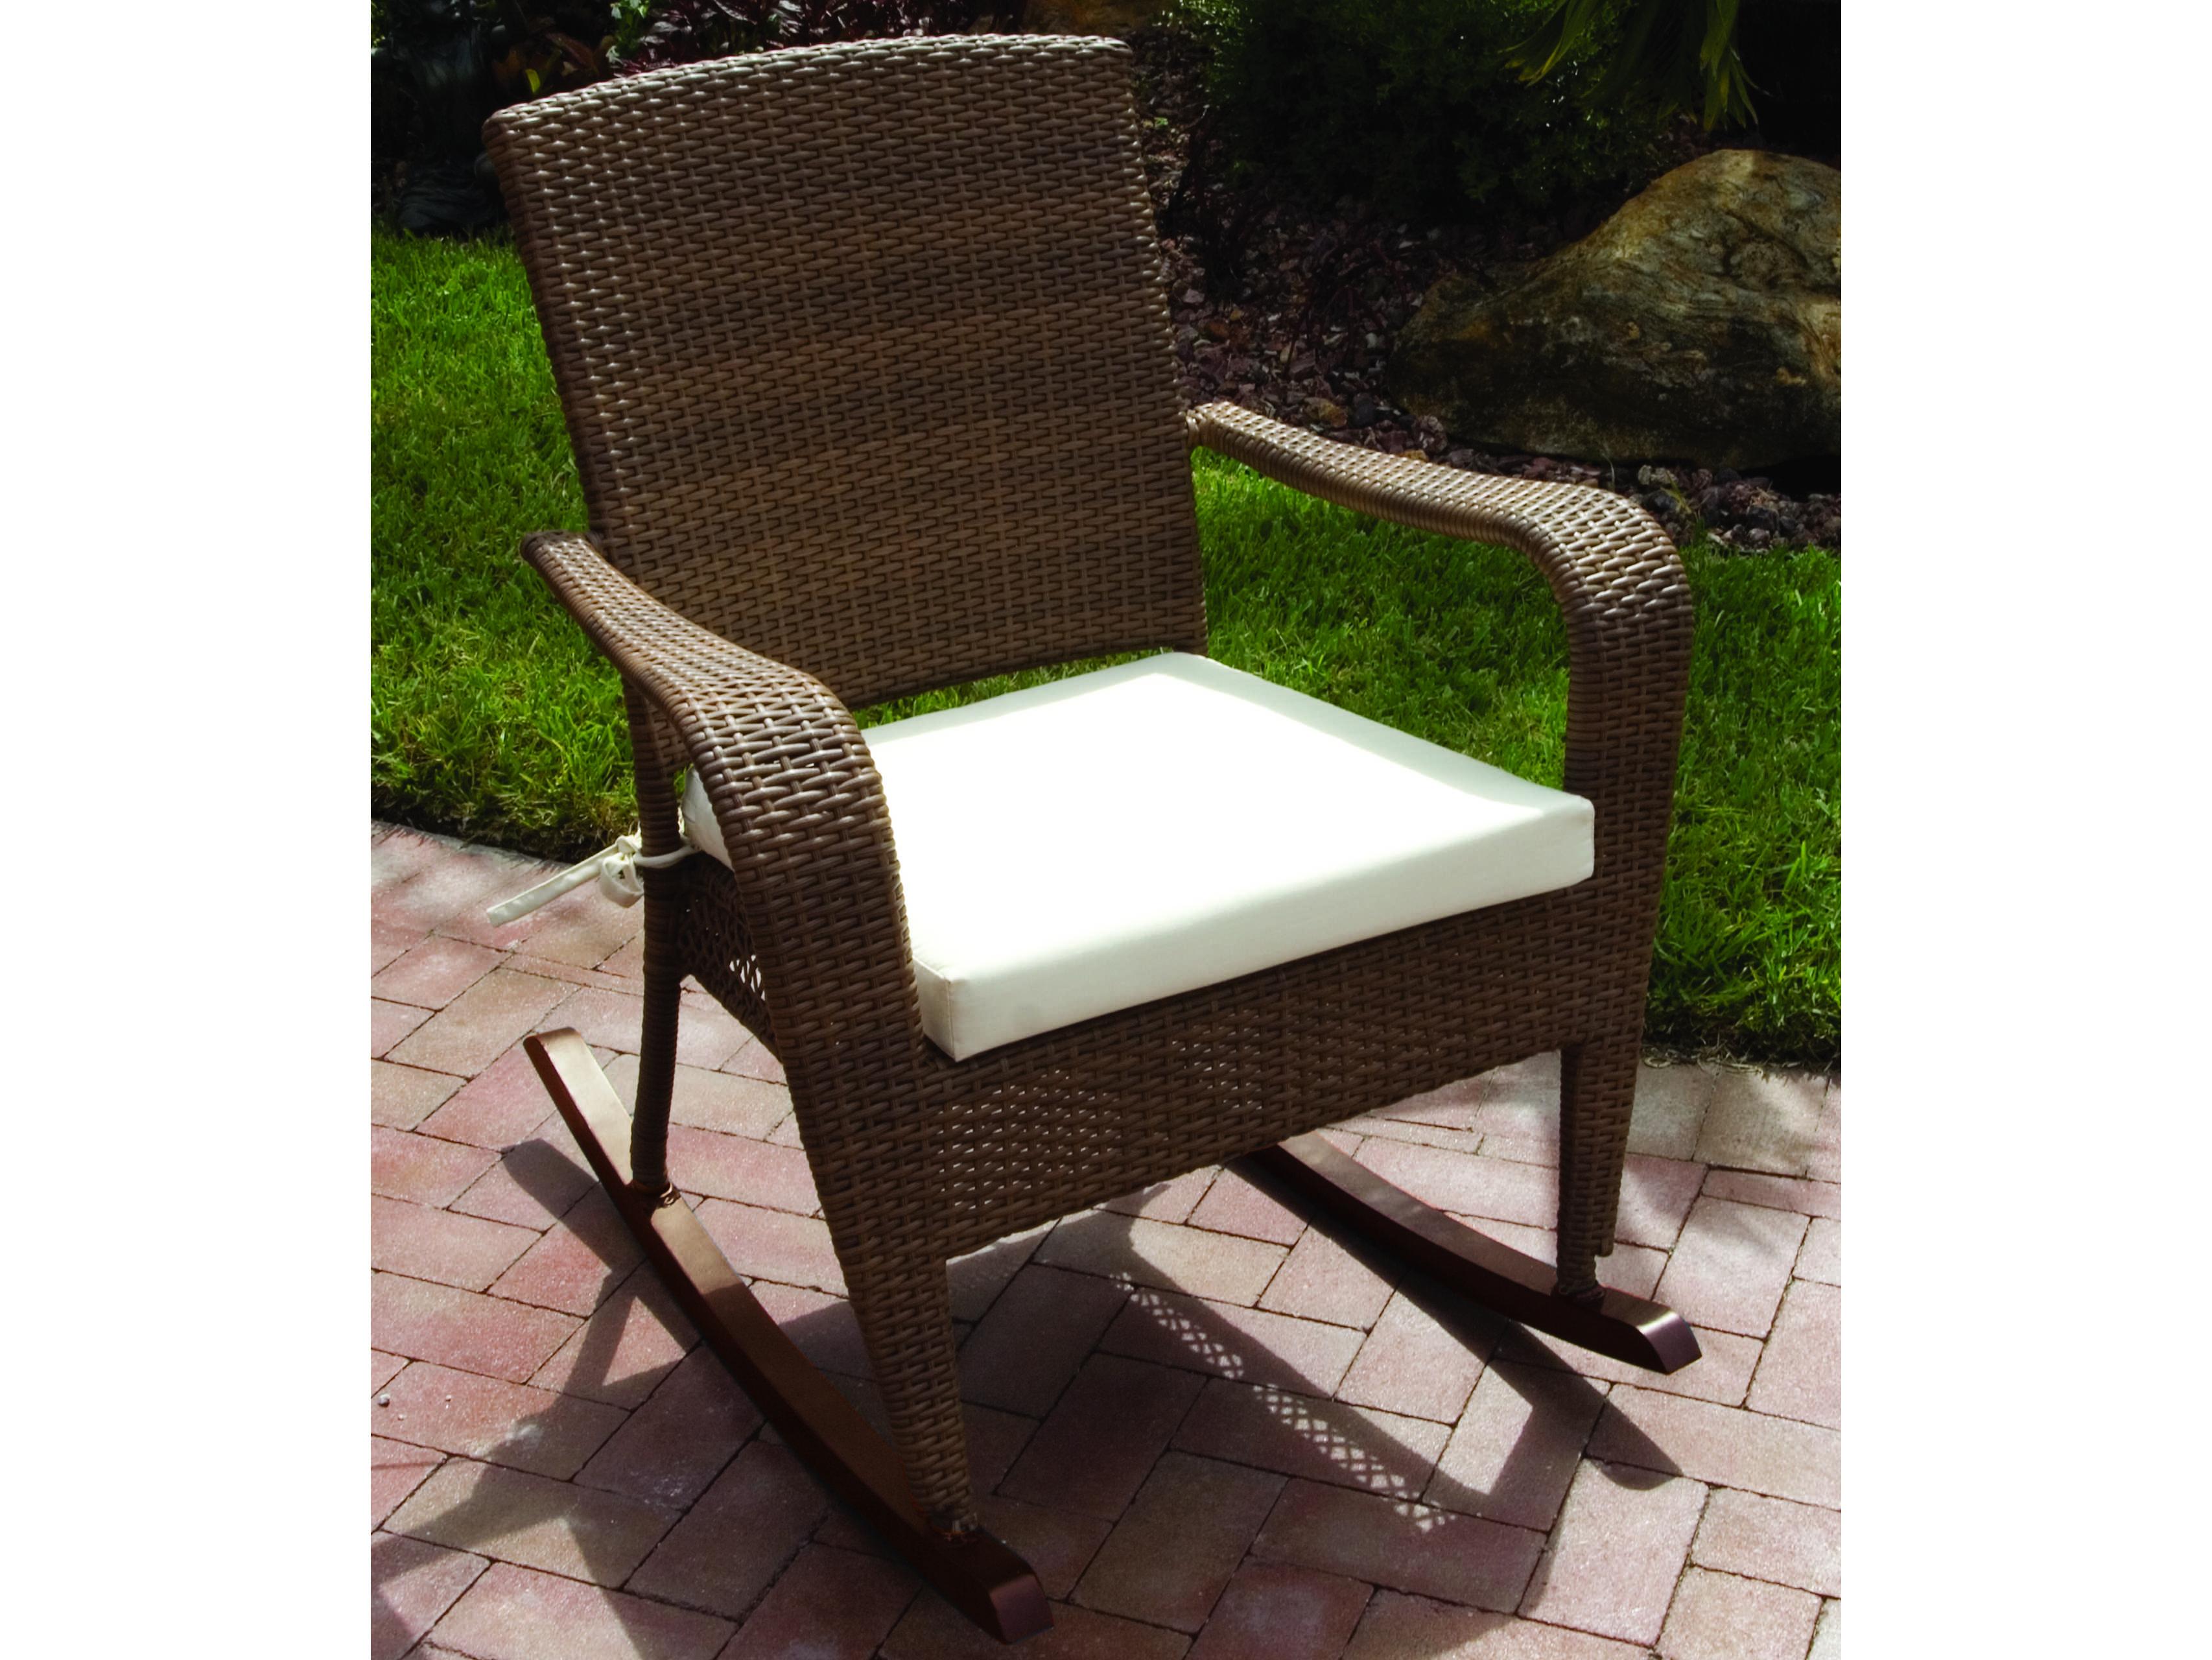 Hospitality Rattan Outdoor Grenada Wicker Rocking Chair